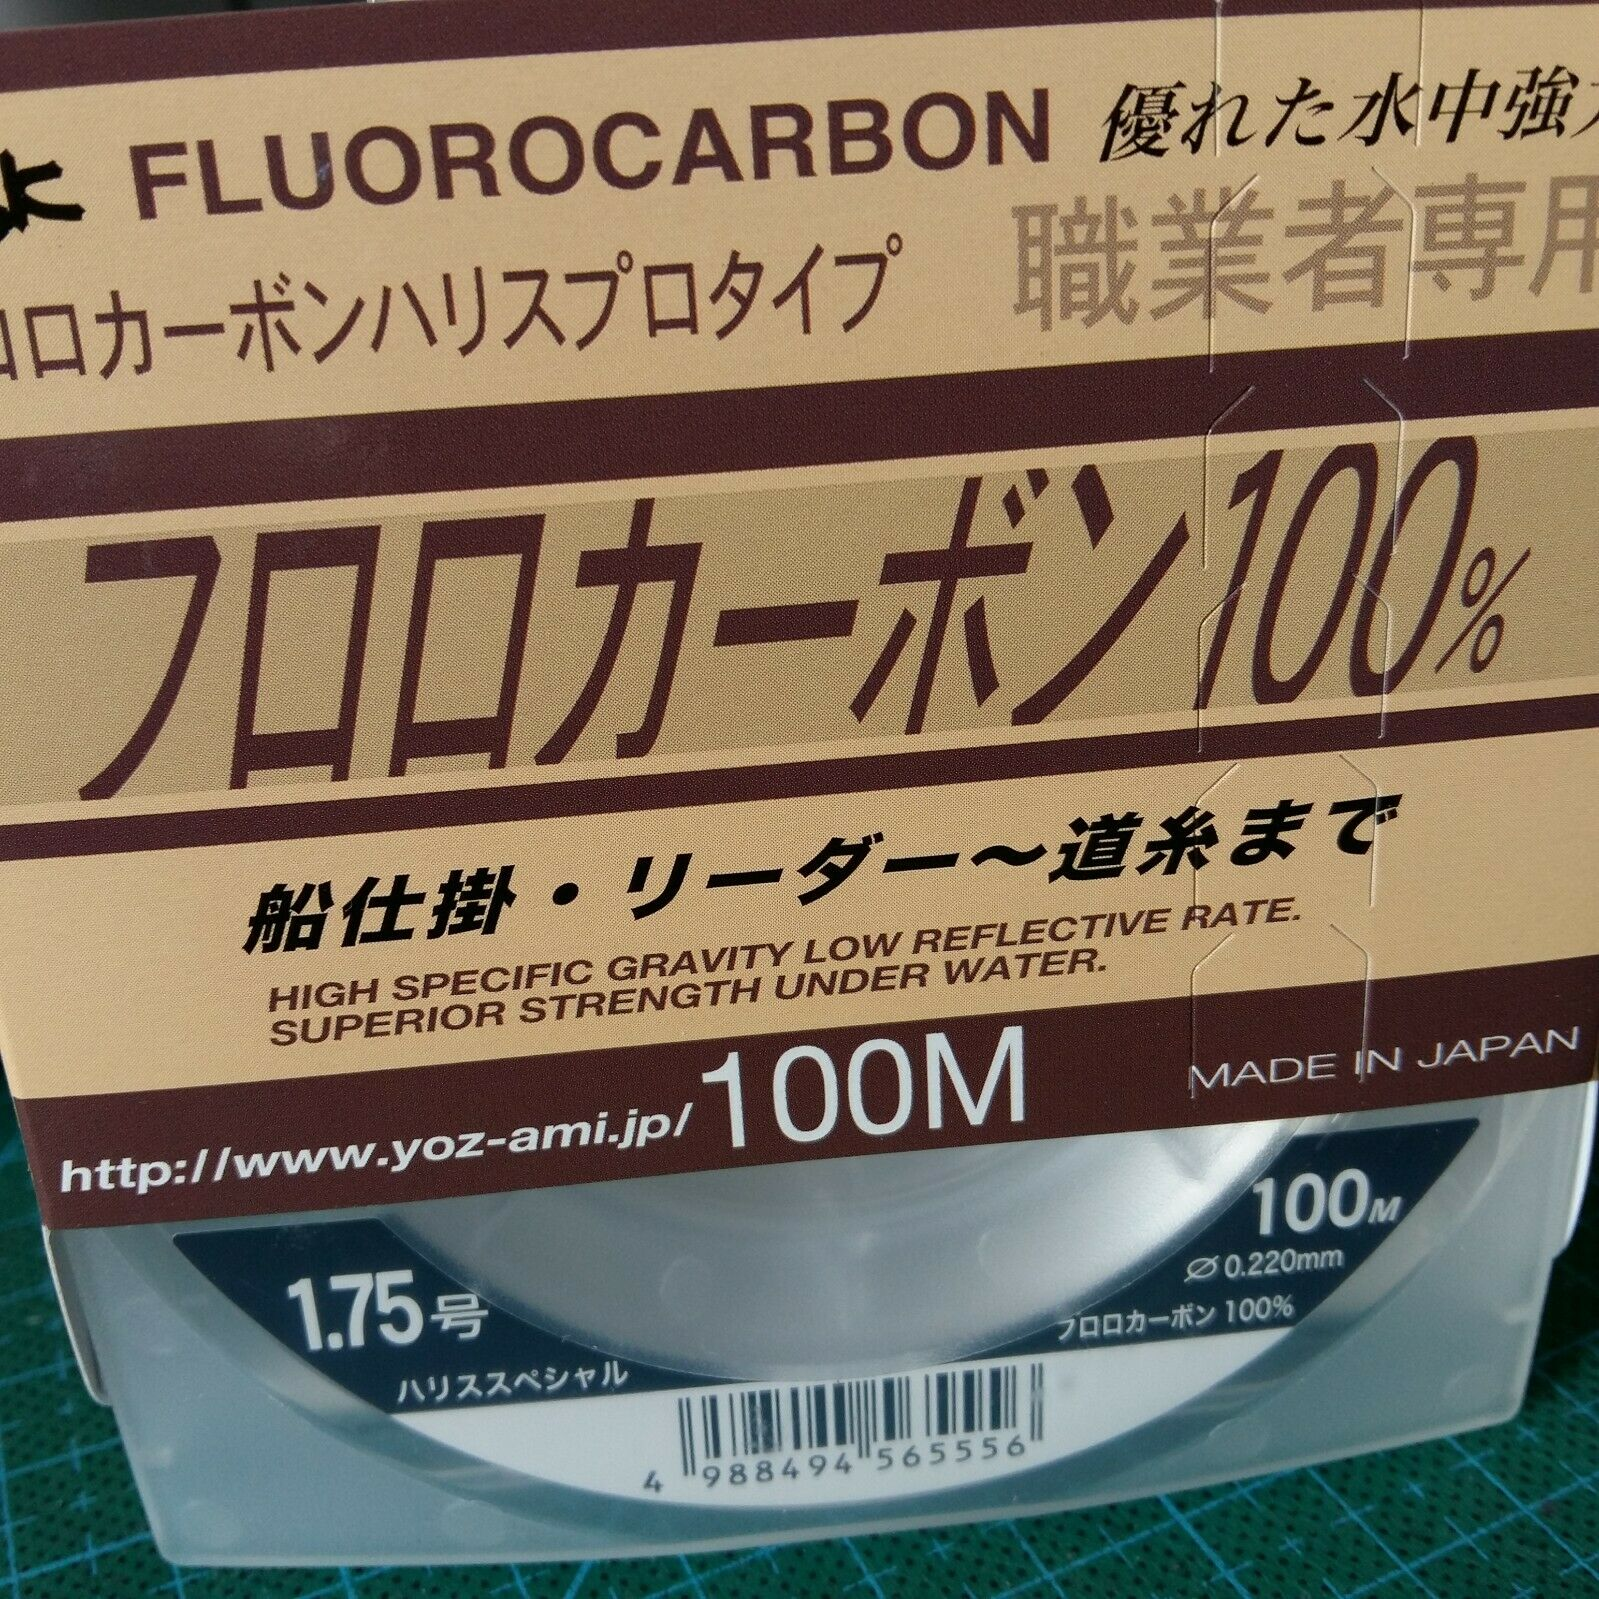 YGK OLLTOLOS FLUOROCARBON Line 100m 7lb #1.75